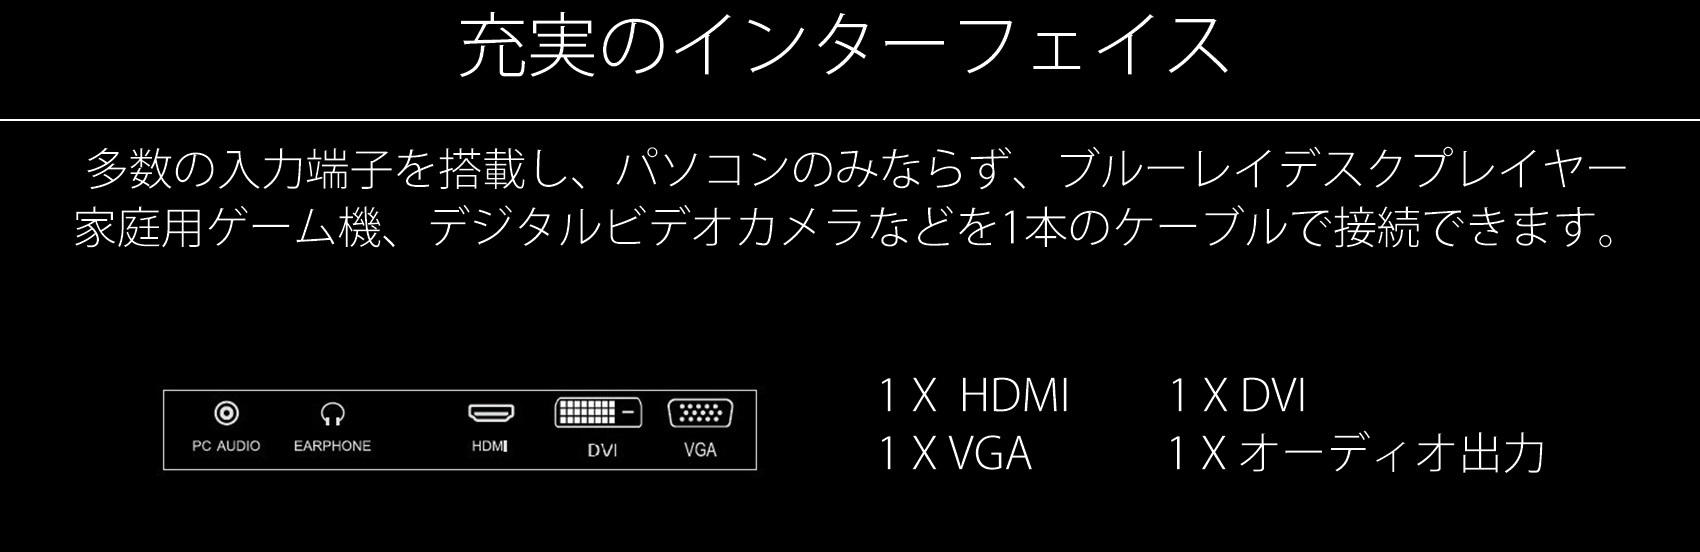 HDMI インターフェース 1920×1080ドット表示に対応する機能付HDMI入力端子(HDCP対応)を搭載し、パソコンのみならず、ブルーレイディスクプレイヤー、家庭用ゲーム機、デジタルビデオカメラなどを1本のケーブルで接続できます。筐体カラーは、白の1色となります。